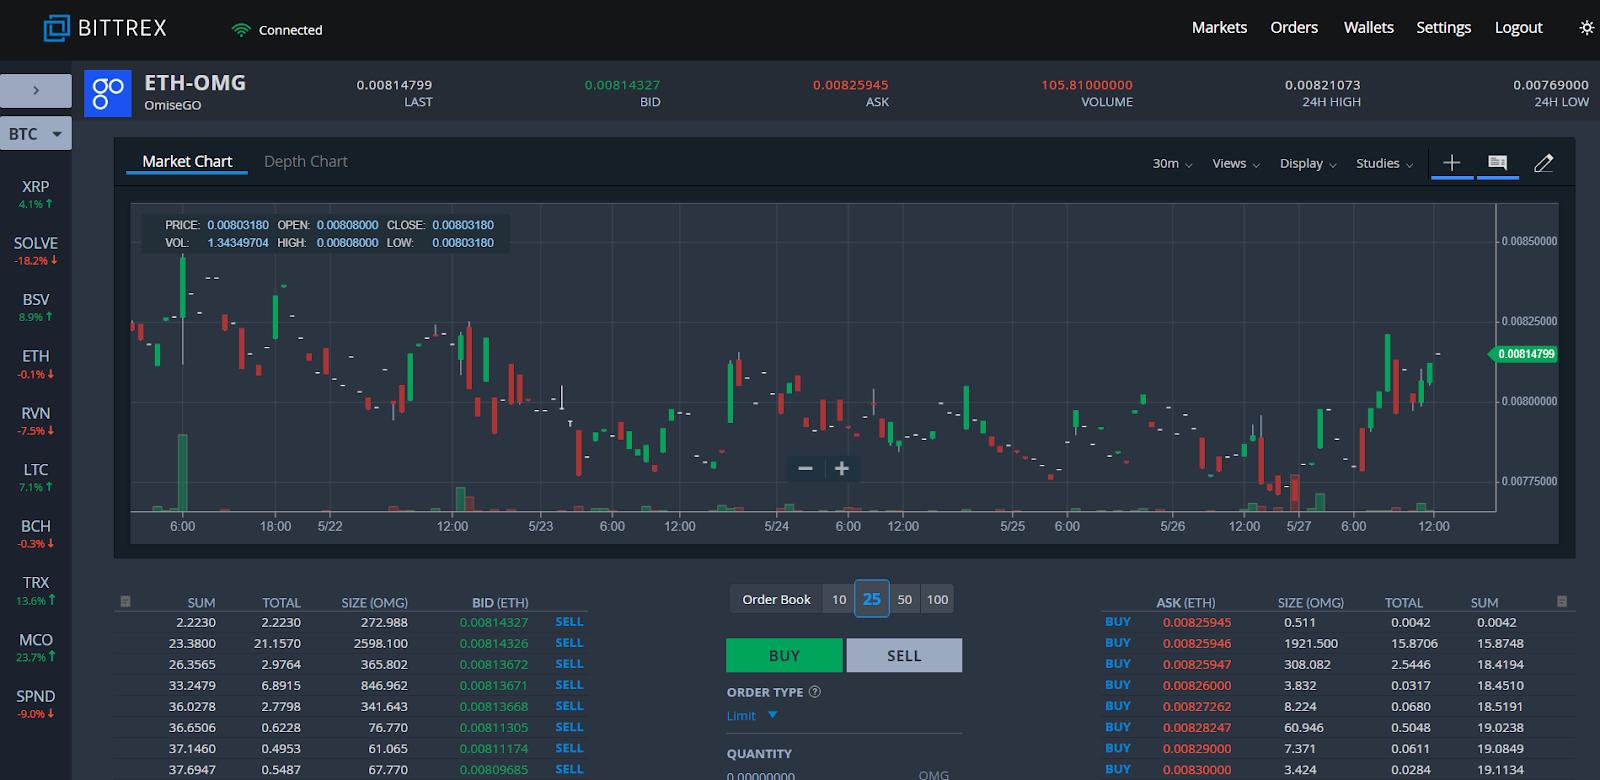 Bittrex ETH-OMG screen shot.